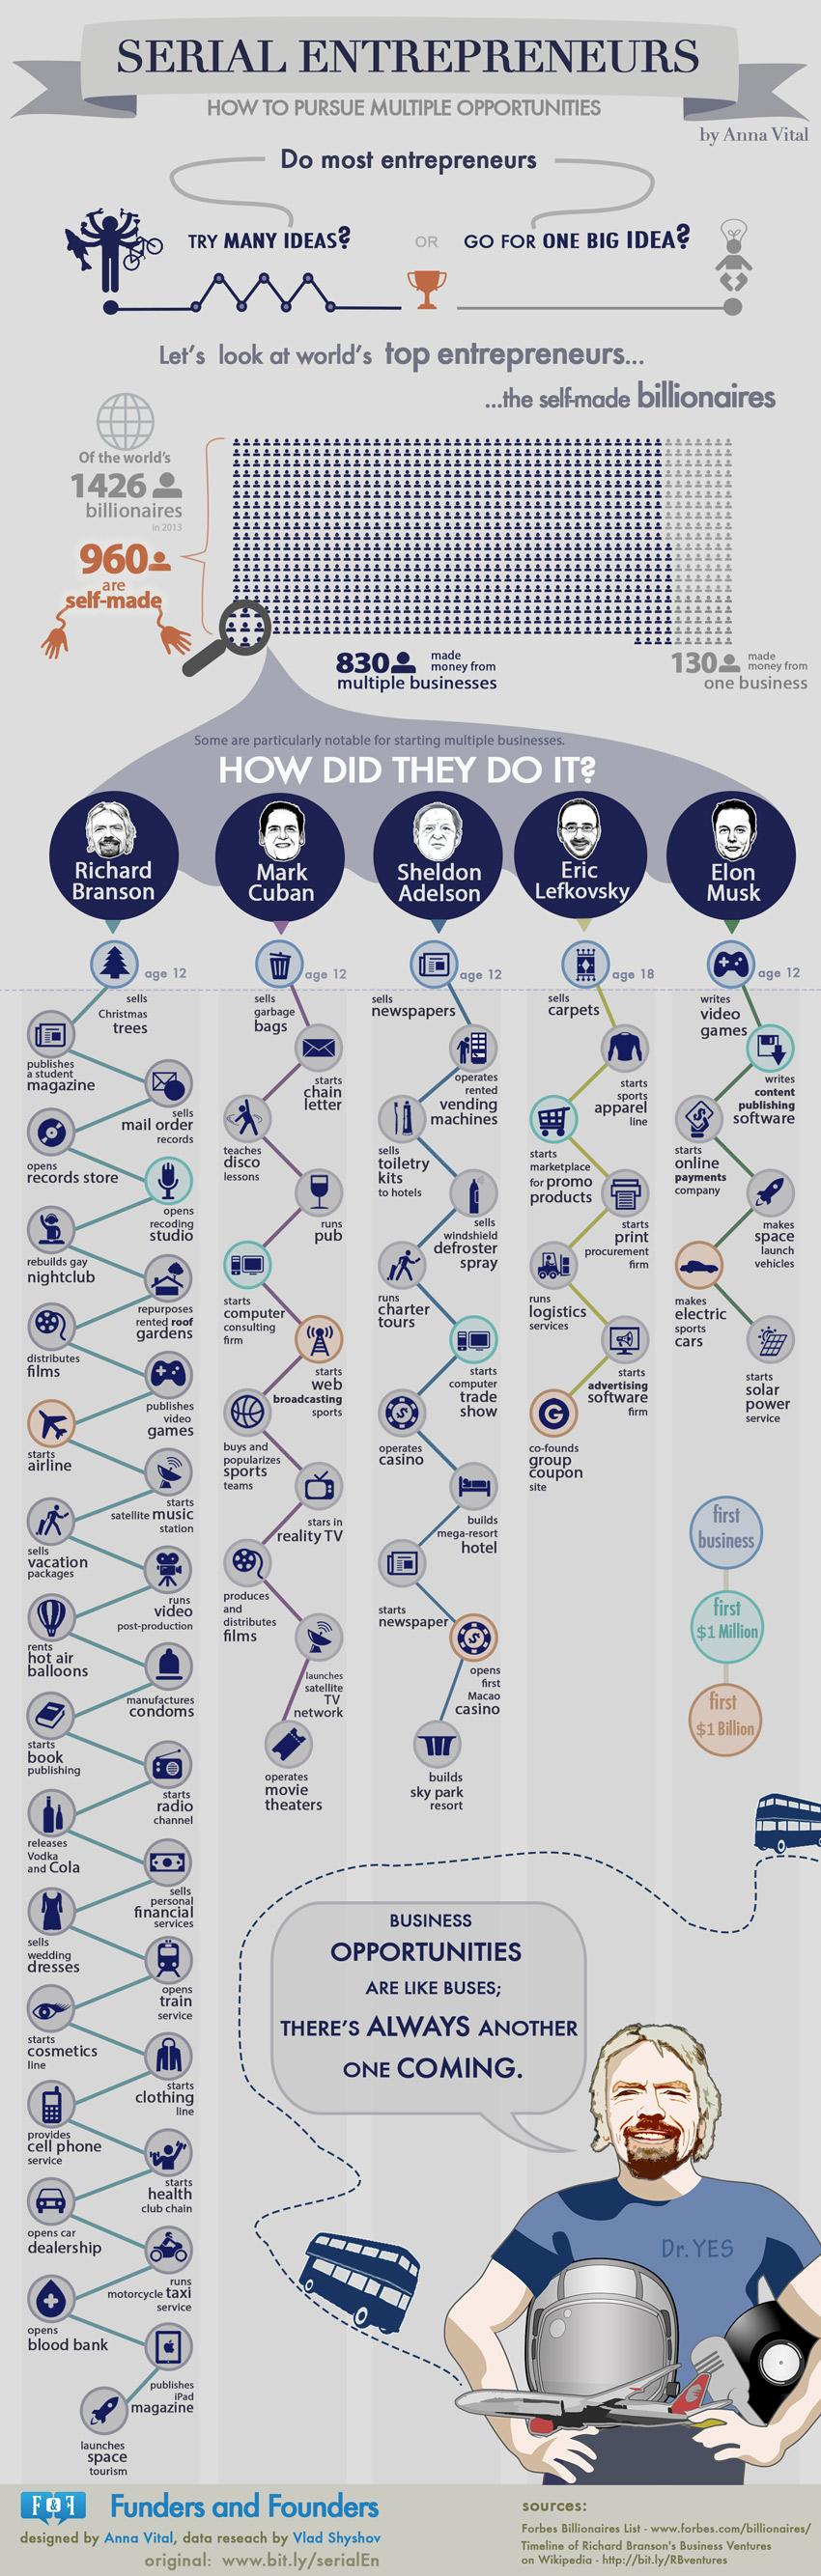 wild-crazy-career-paths-5-self-made (1)